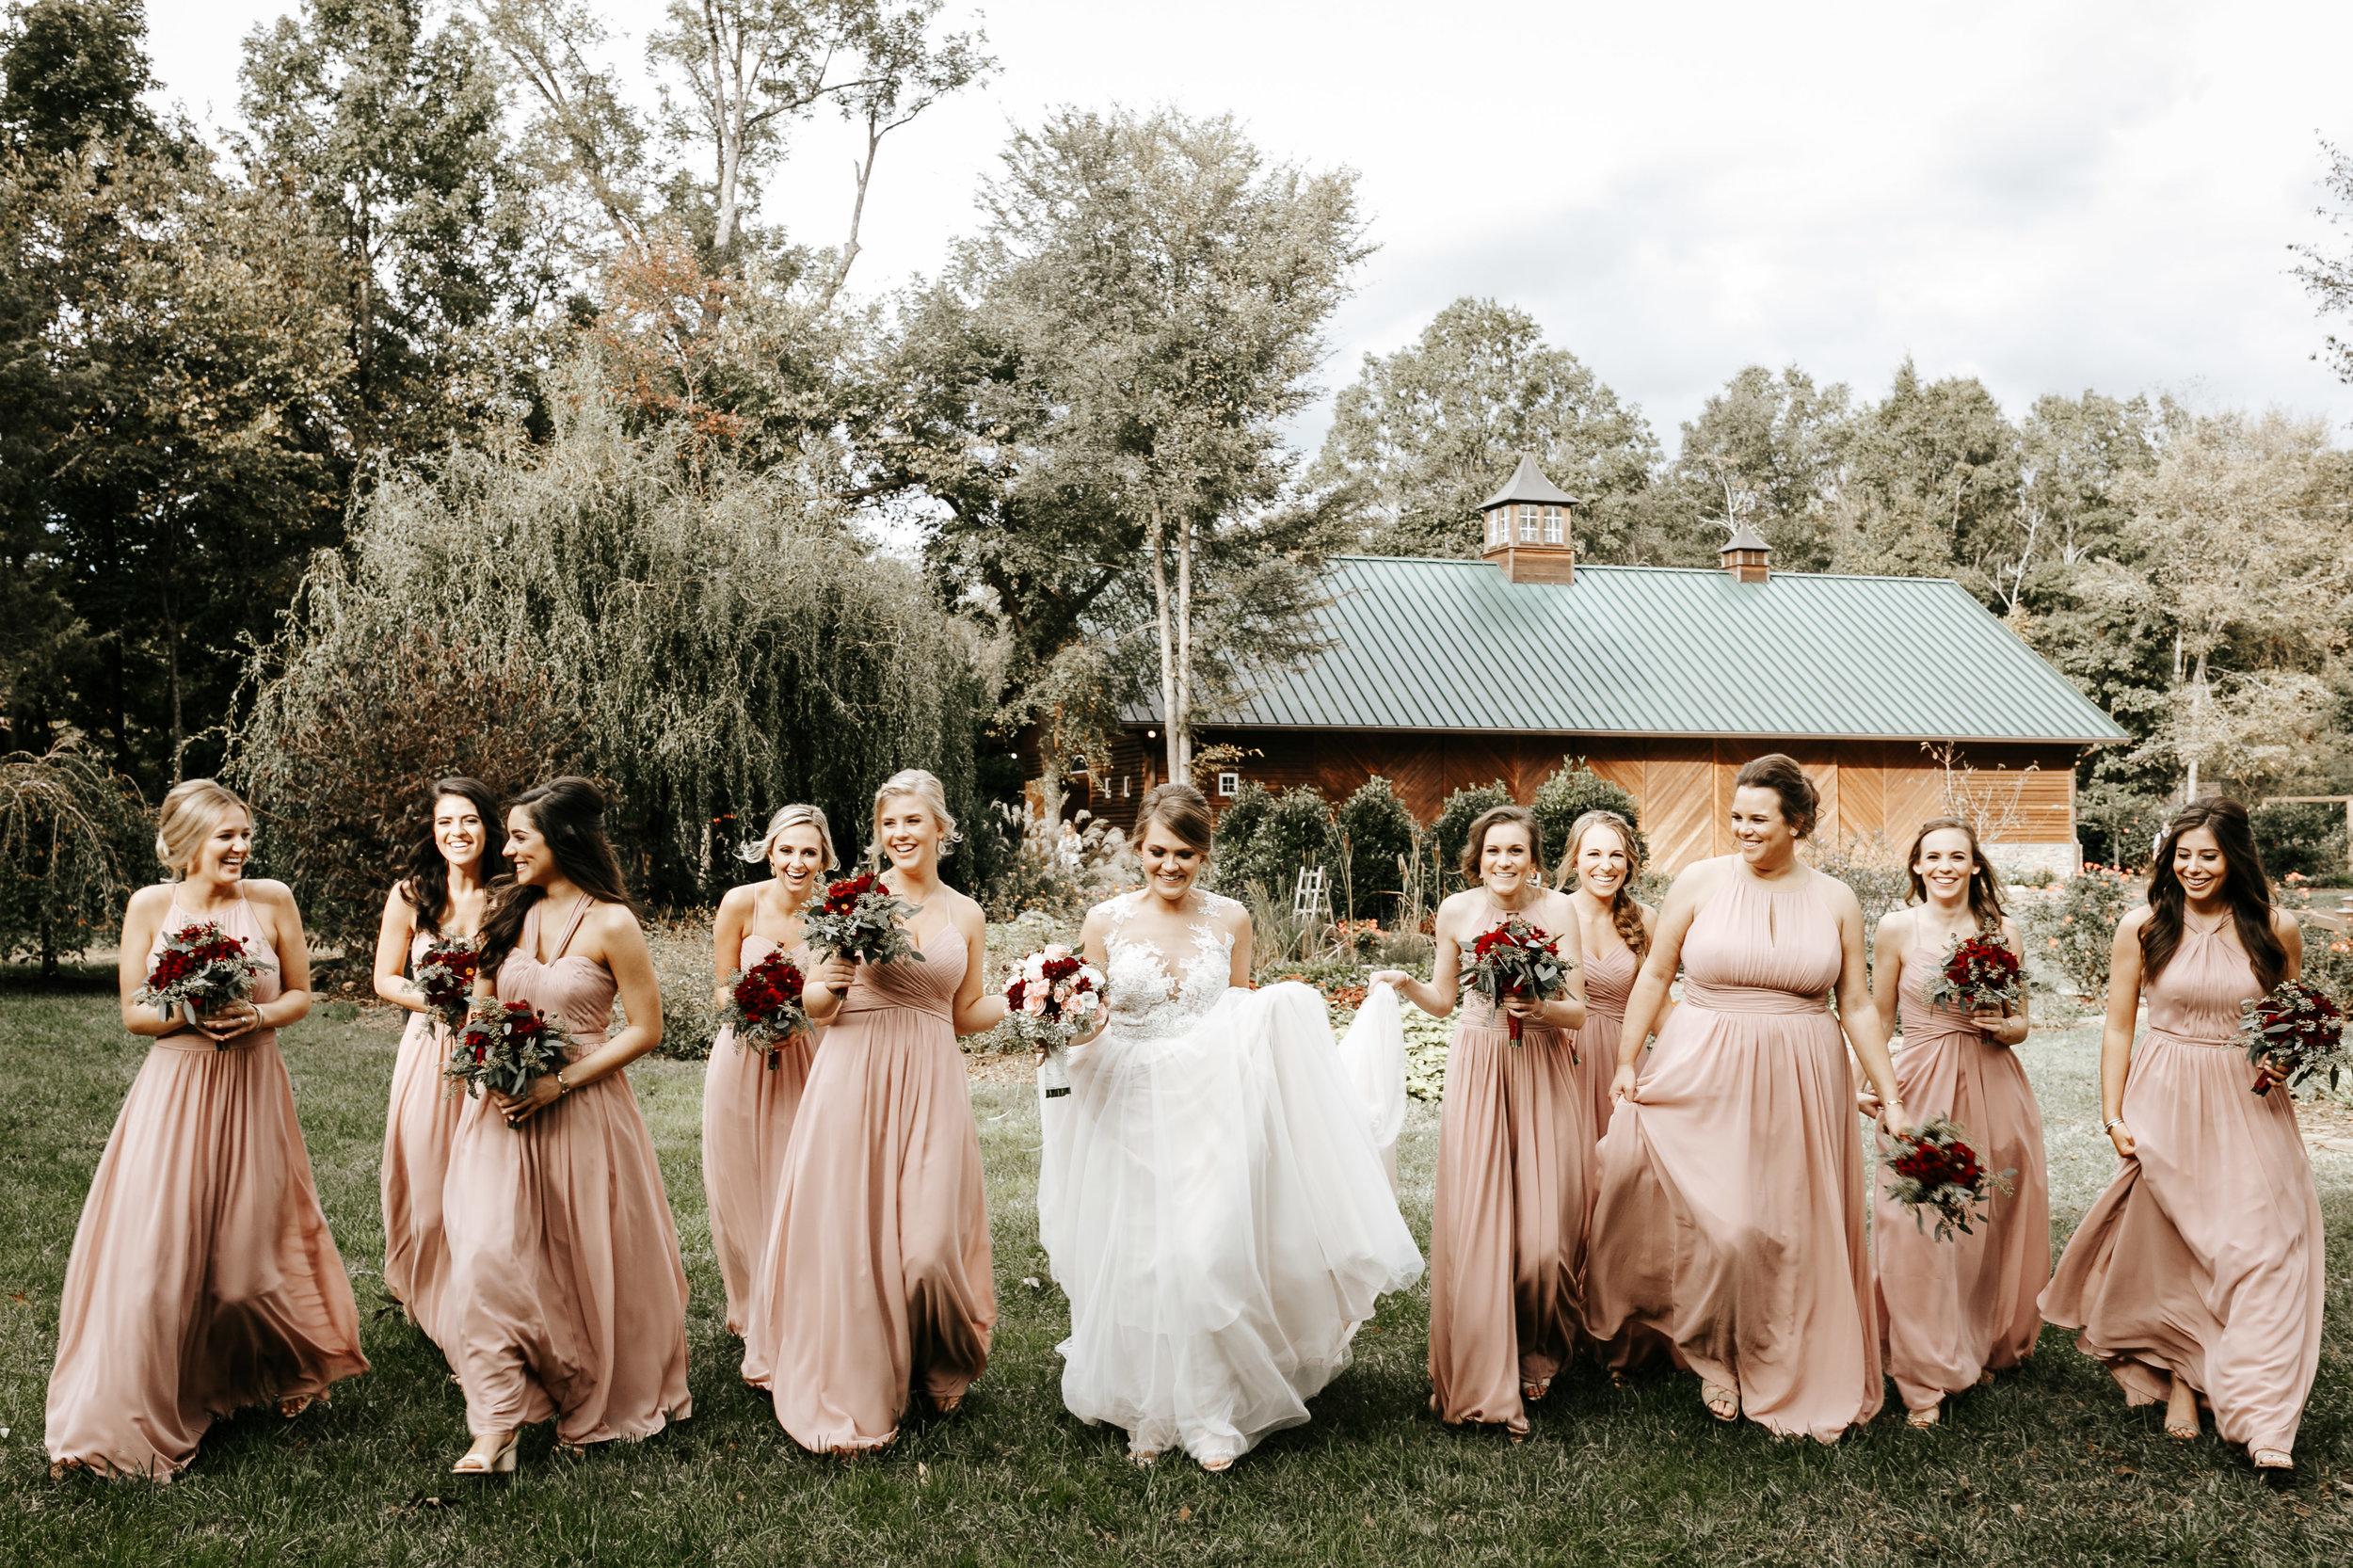 jessicabrandonwedding-21.jpg